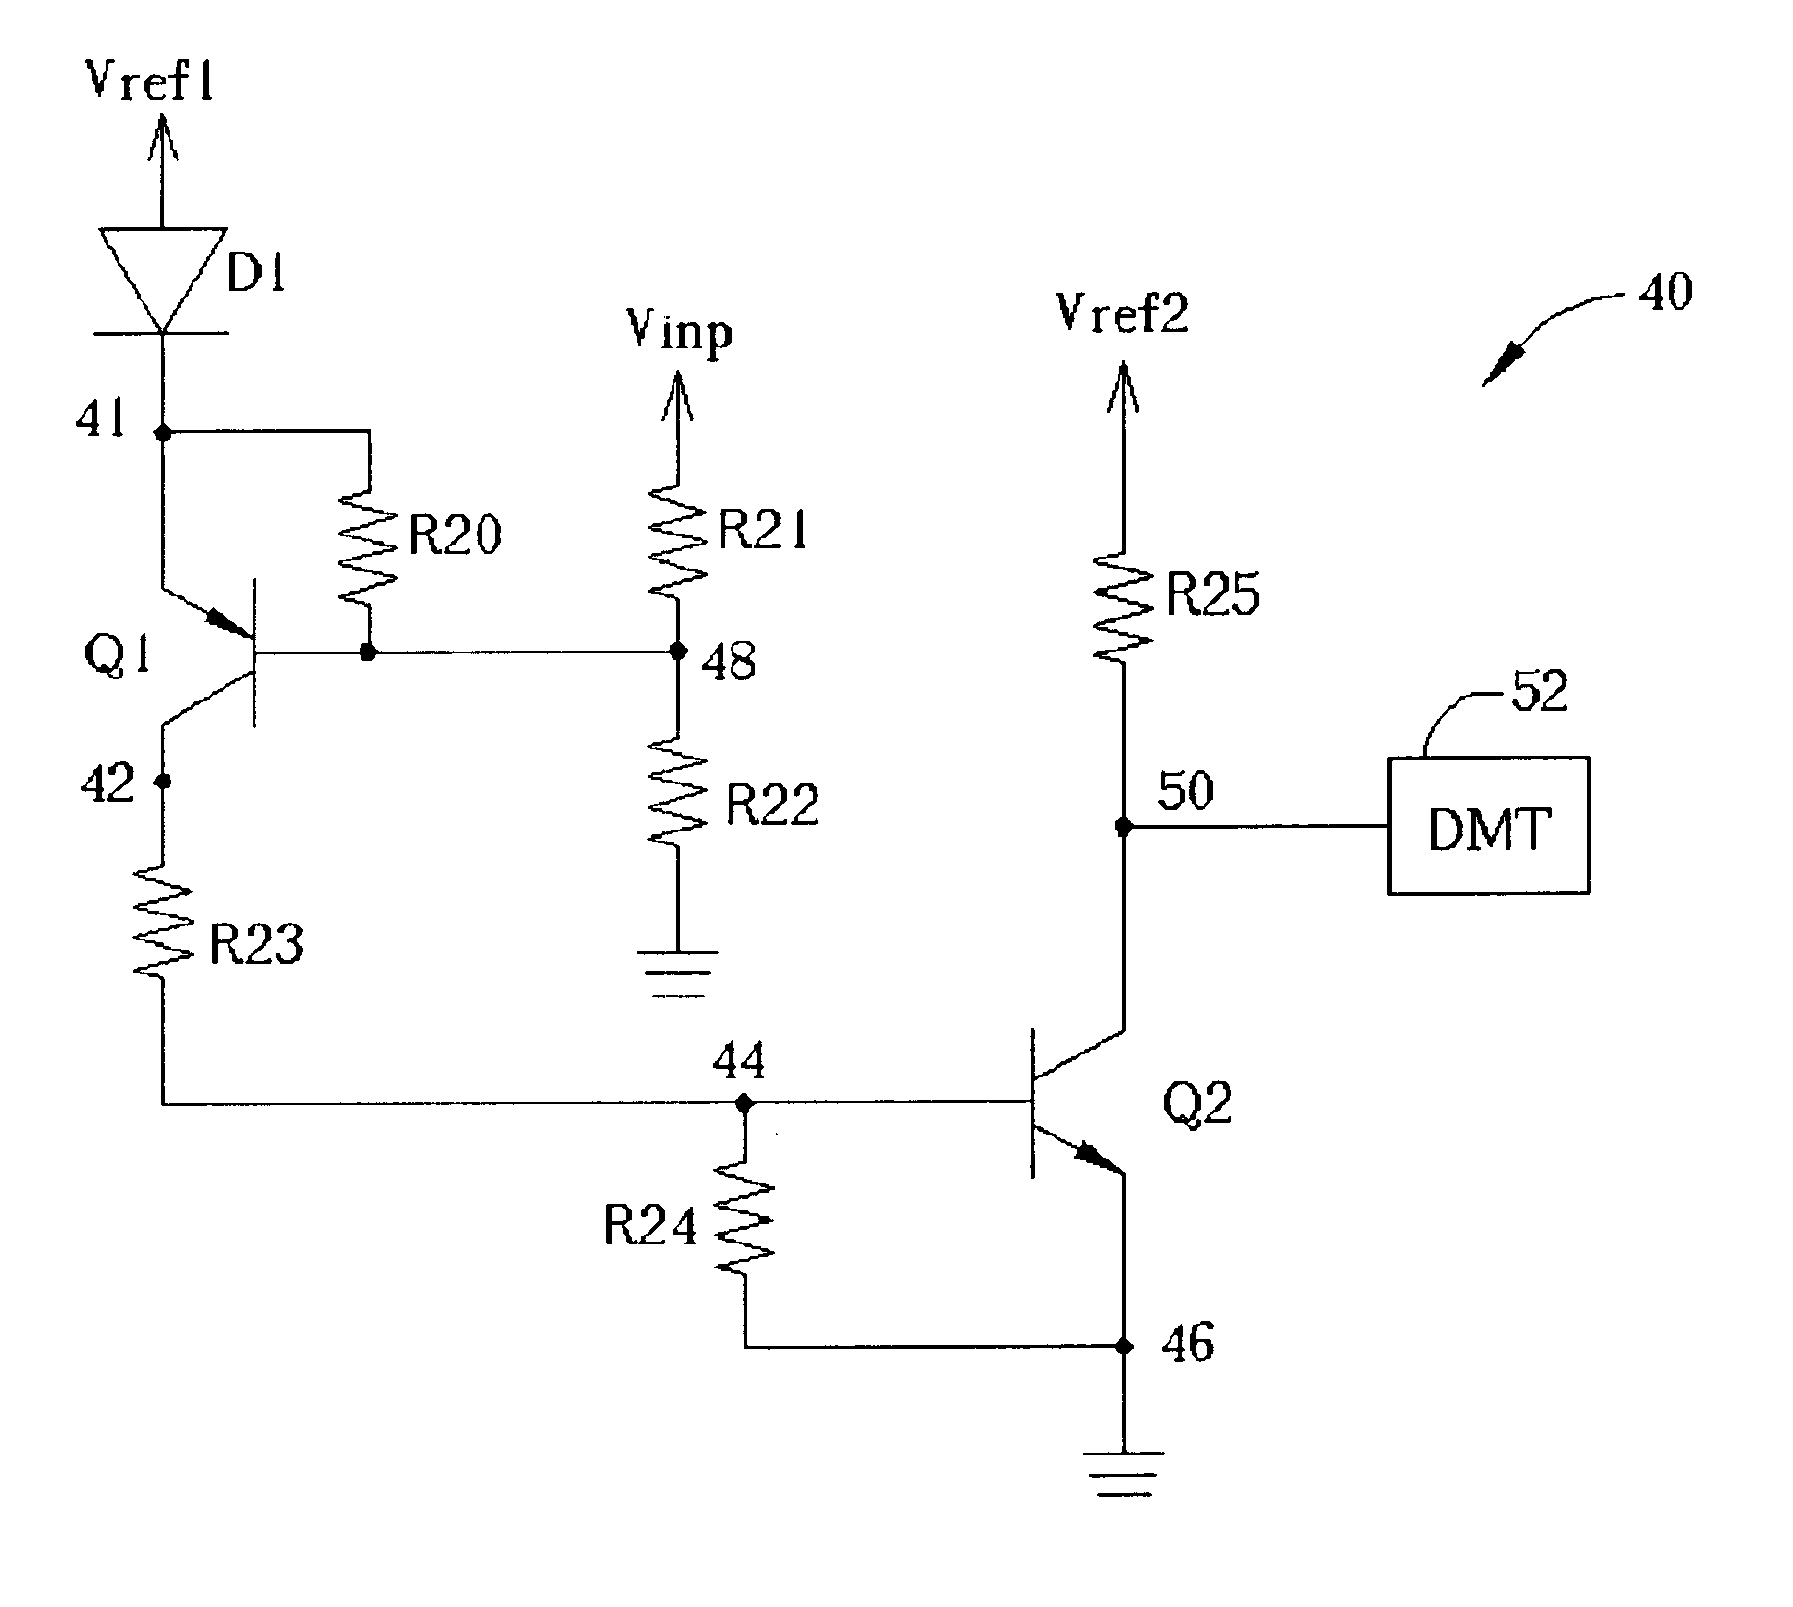 Low Voltage Detection Circuit Diagram Electrical Wiring Diagrams Alternatingredgreen Basiccircuit Seekiccom Patent Us6661258 Detecting For Input Wpve05111k10aa31